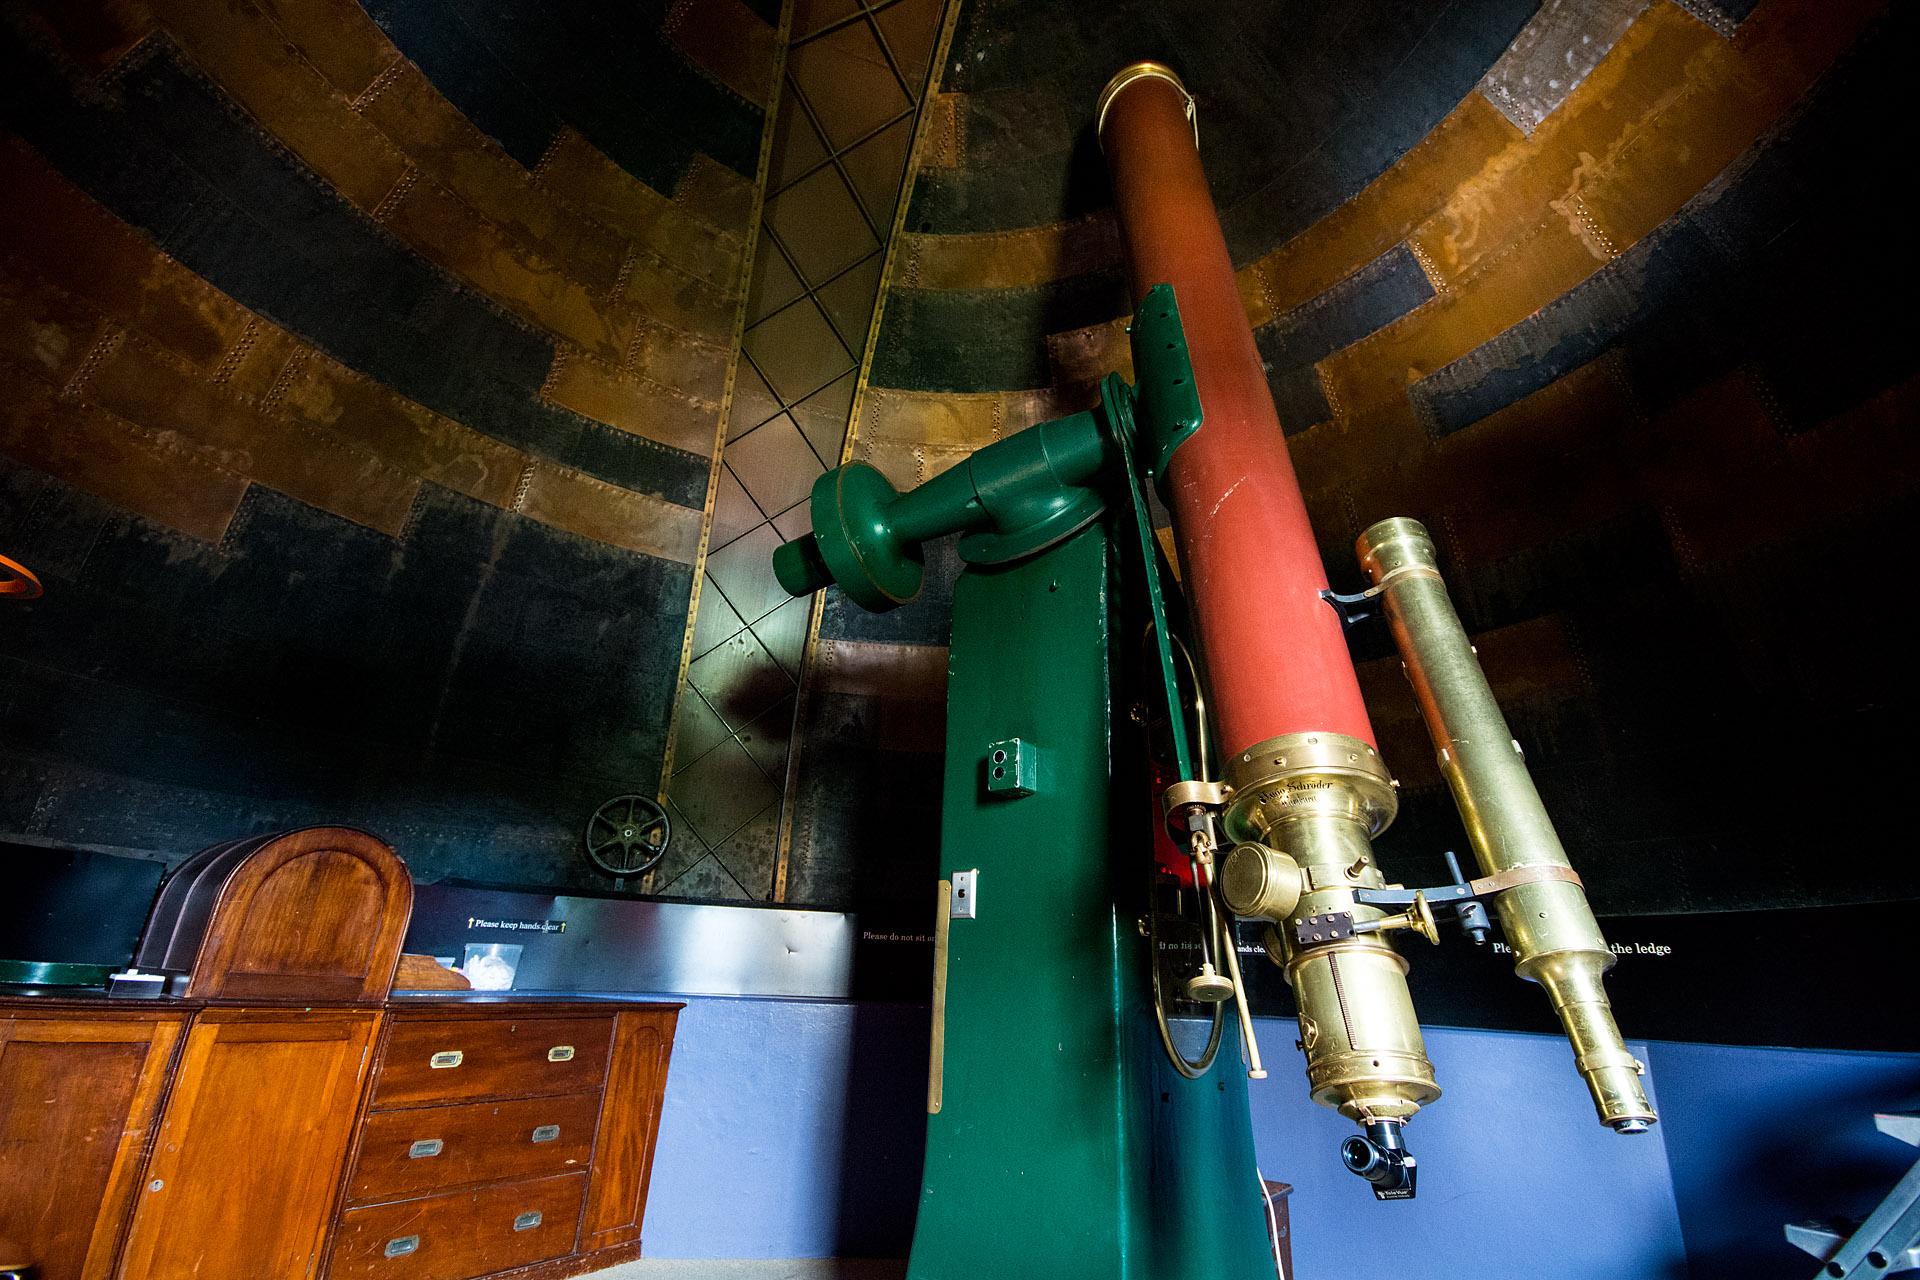 Australia's oldest telescope